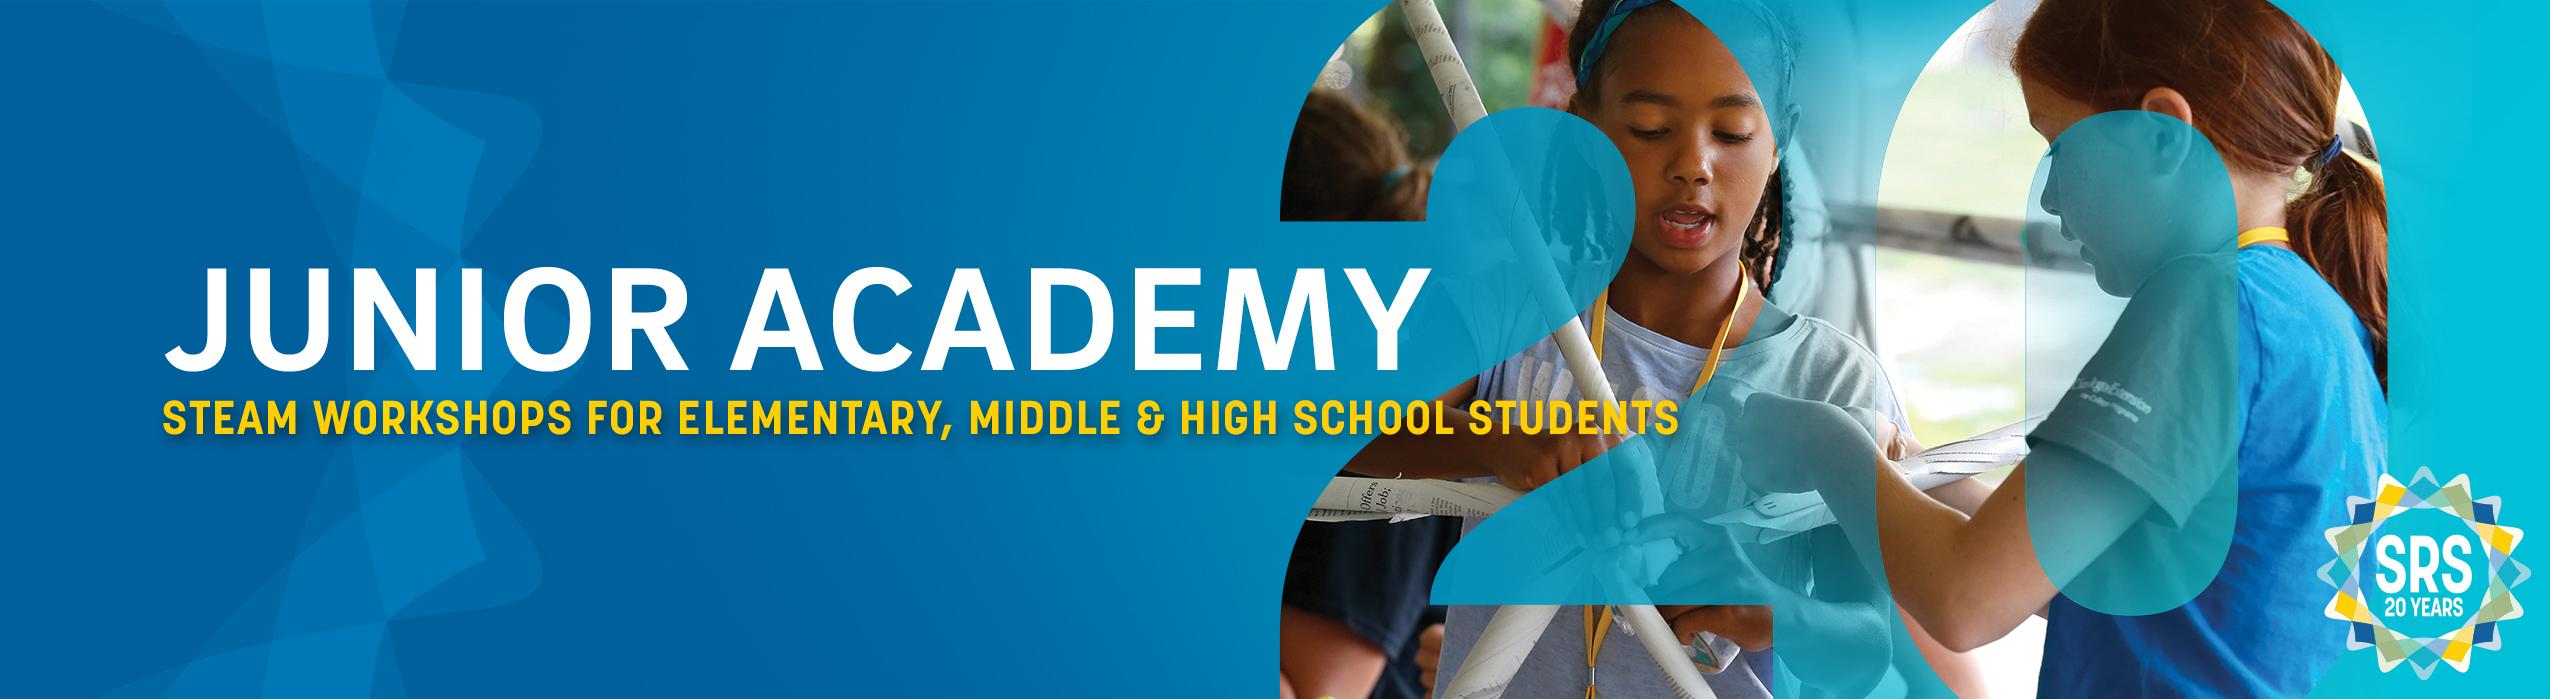 Steam summer workshops for elementary, middle & high school